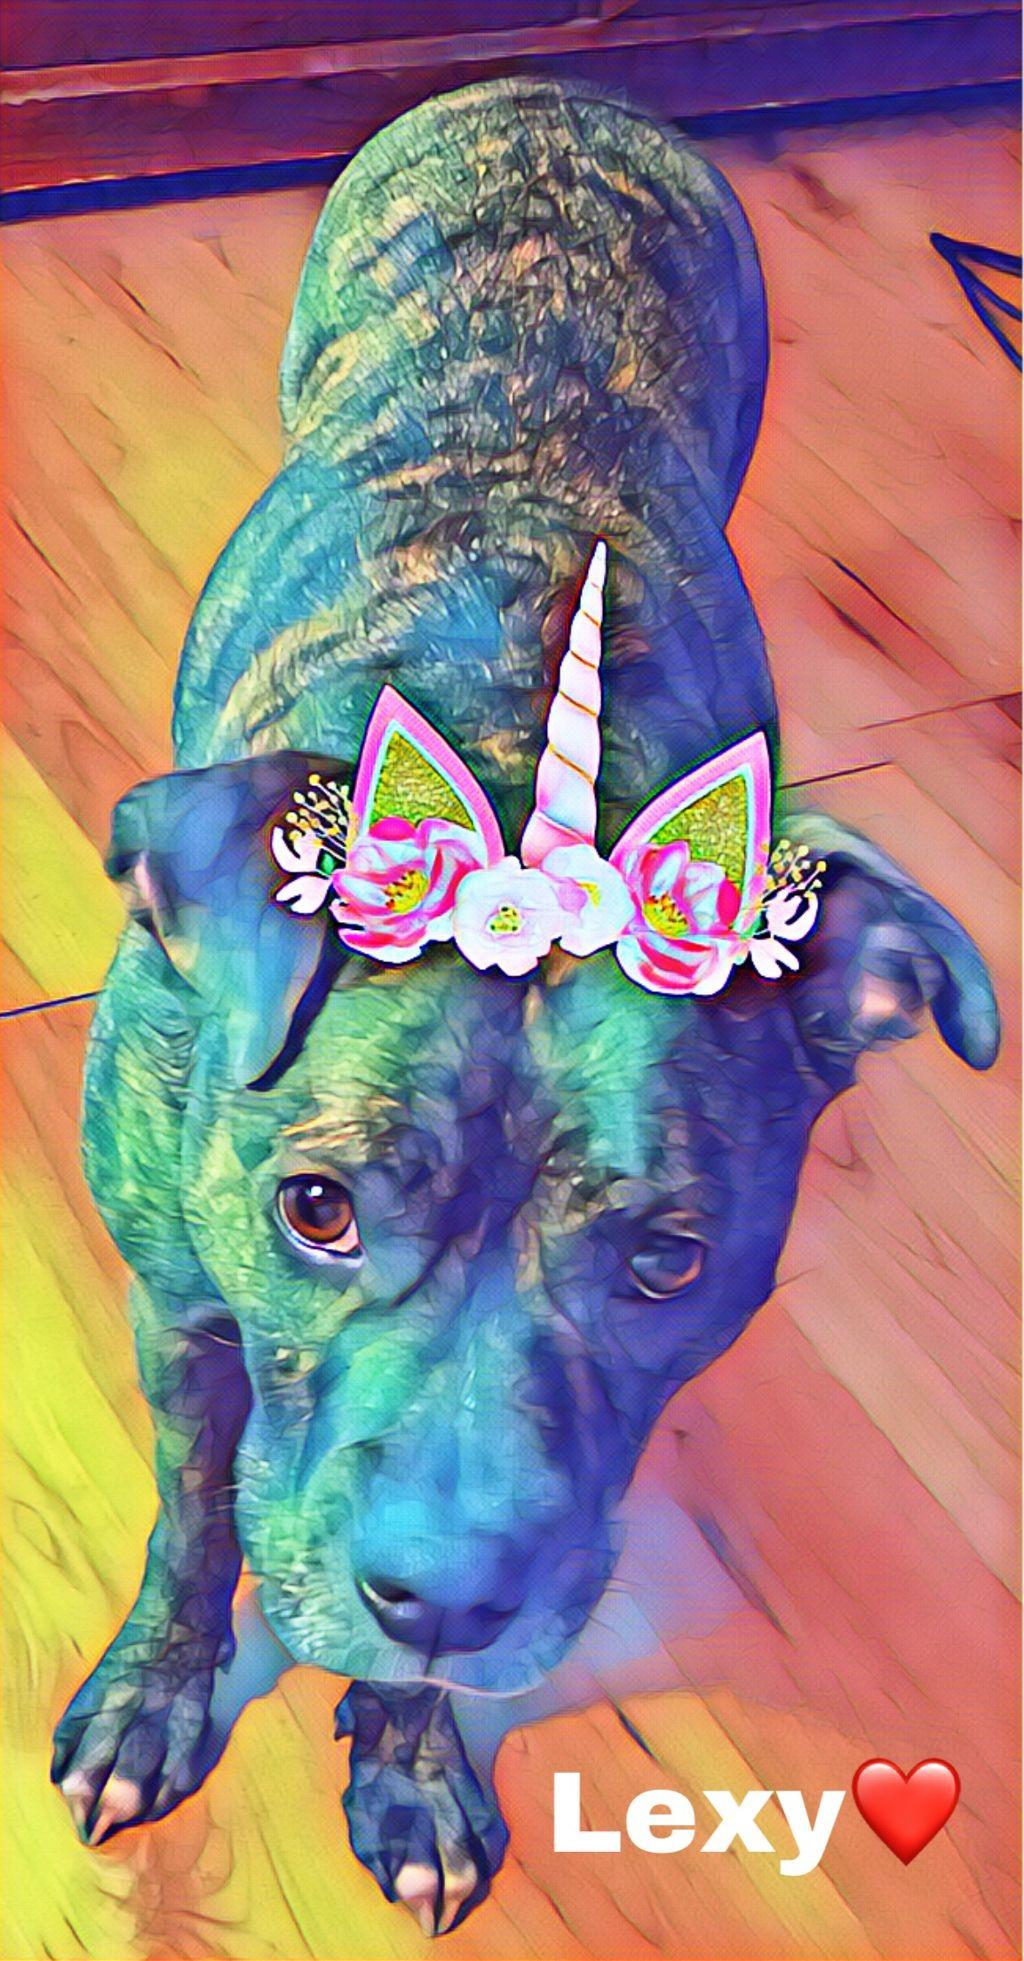 #freetoedit #pitbulllife #sheisanangel #crownflower